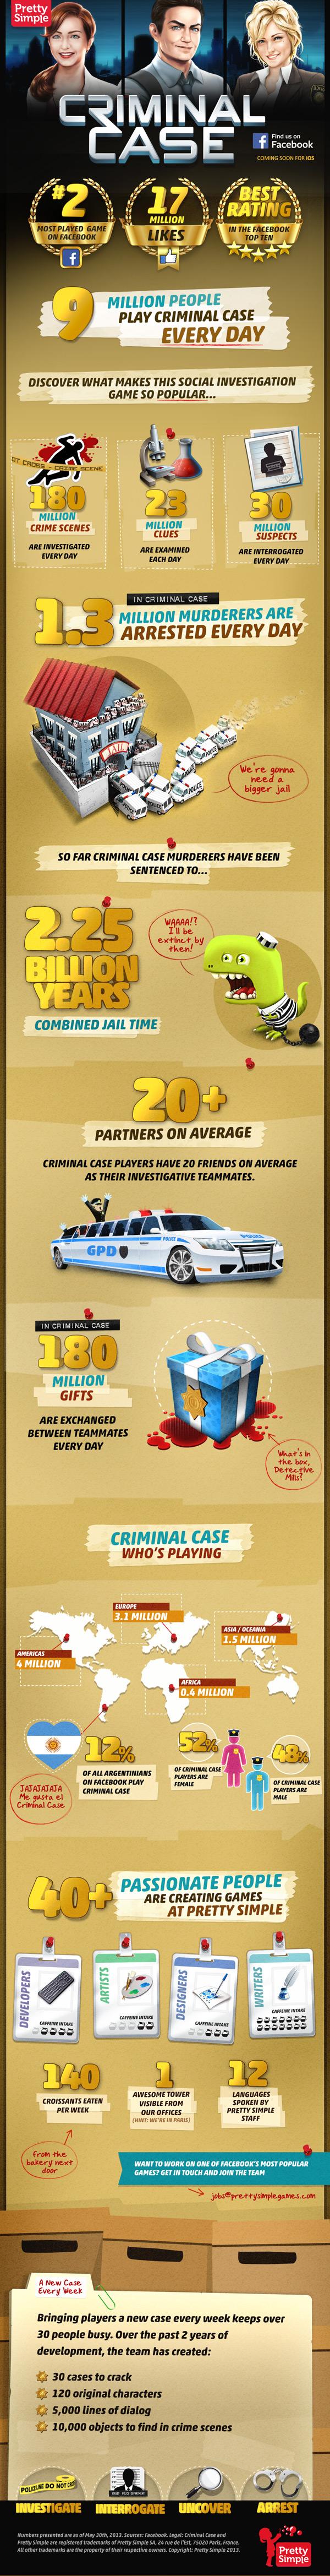 Criminal Case infographic - June 2013